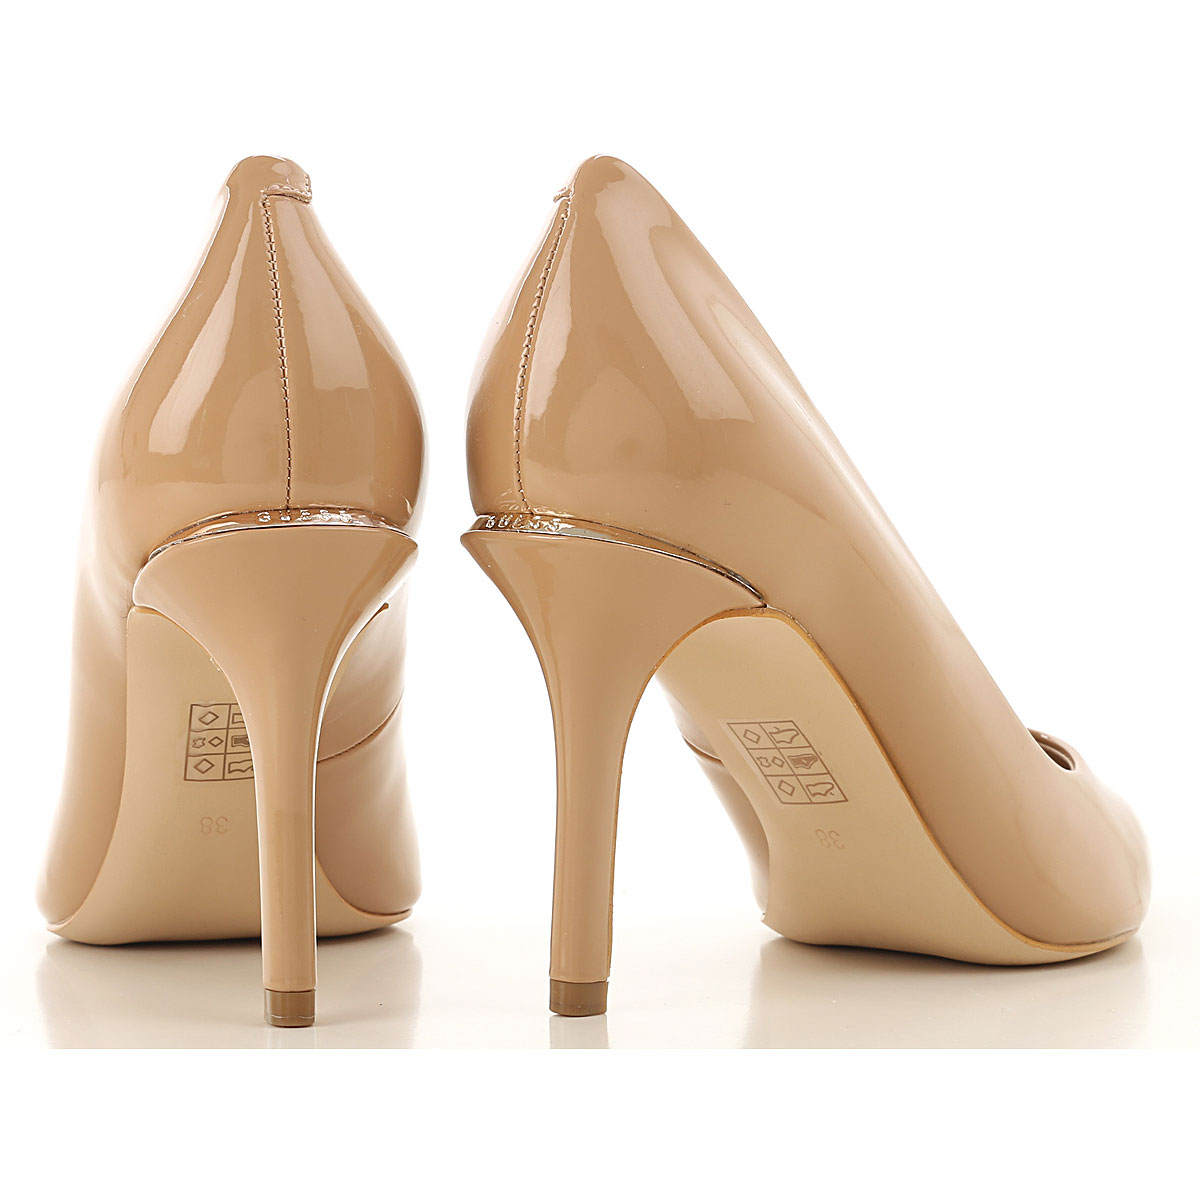 verano Para 2019 Primavera Guess nbsp; Beige Zapatos Mujer PTwABWBq